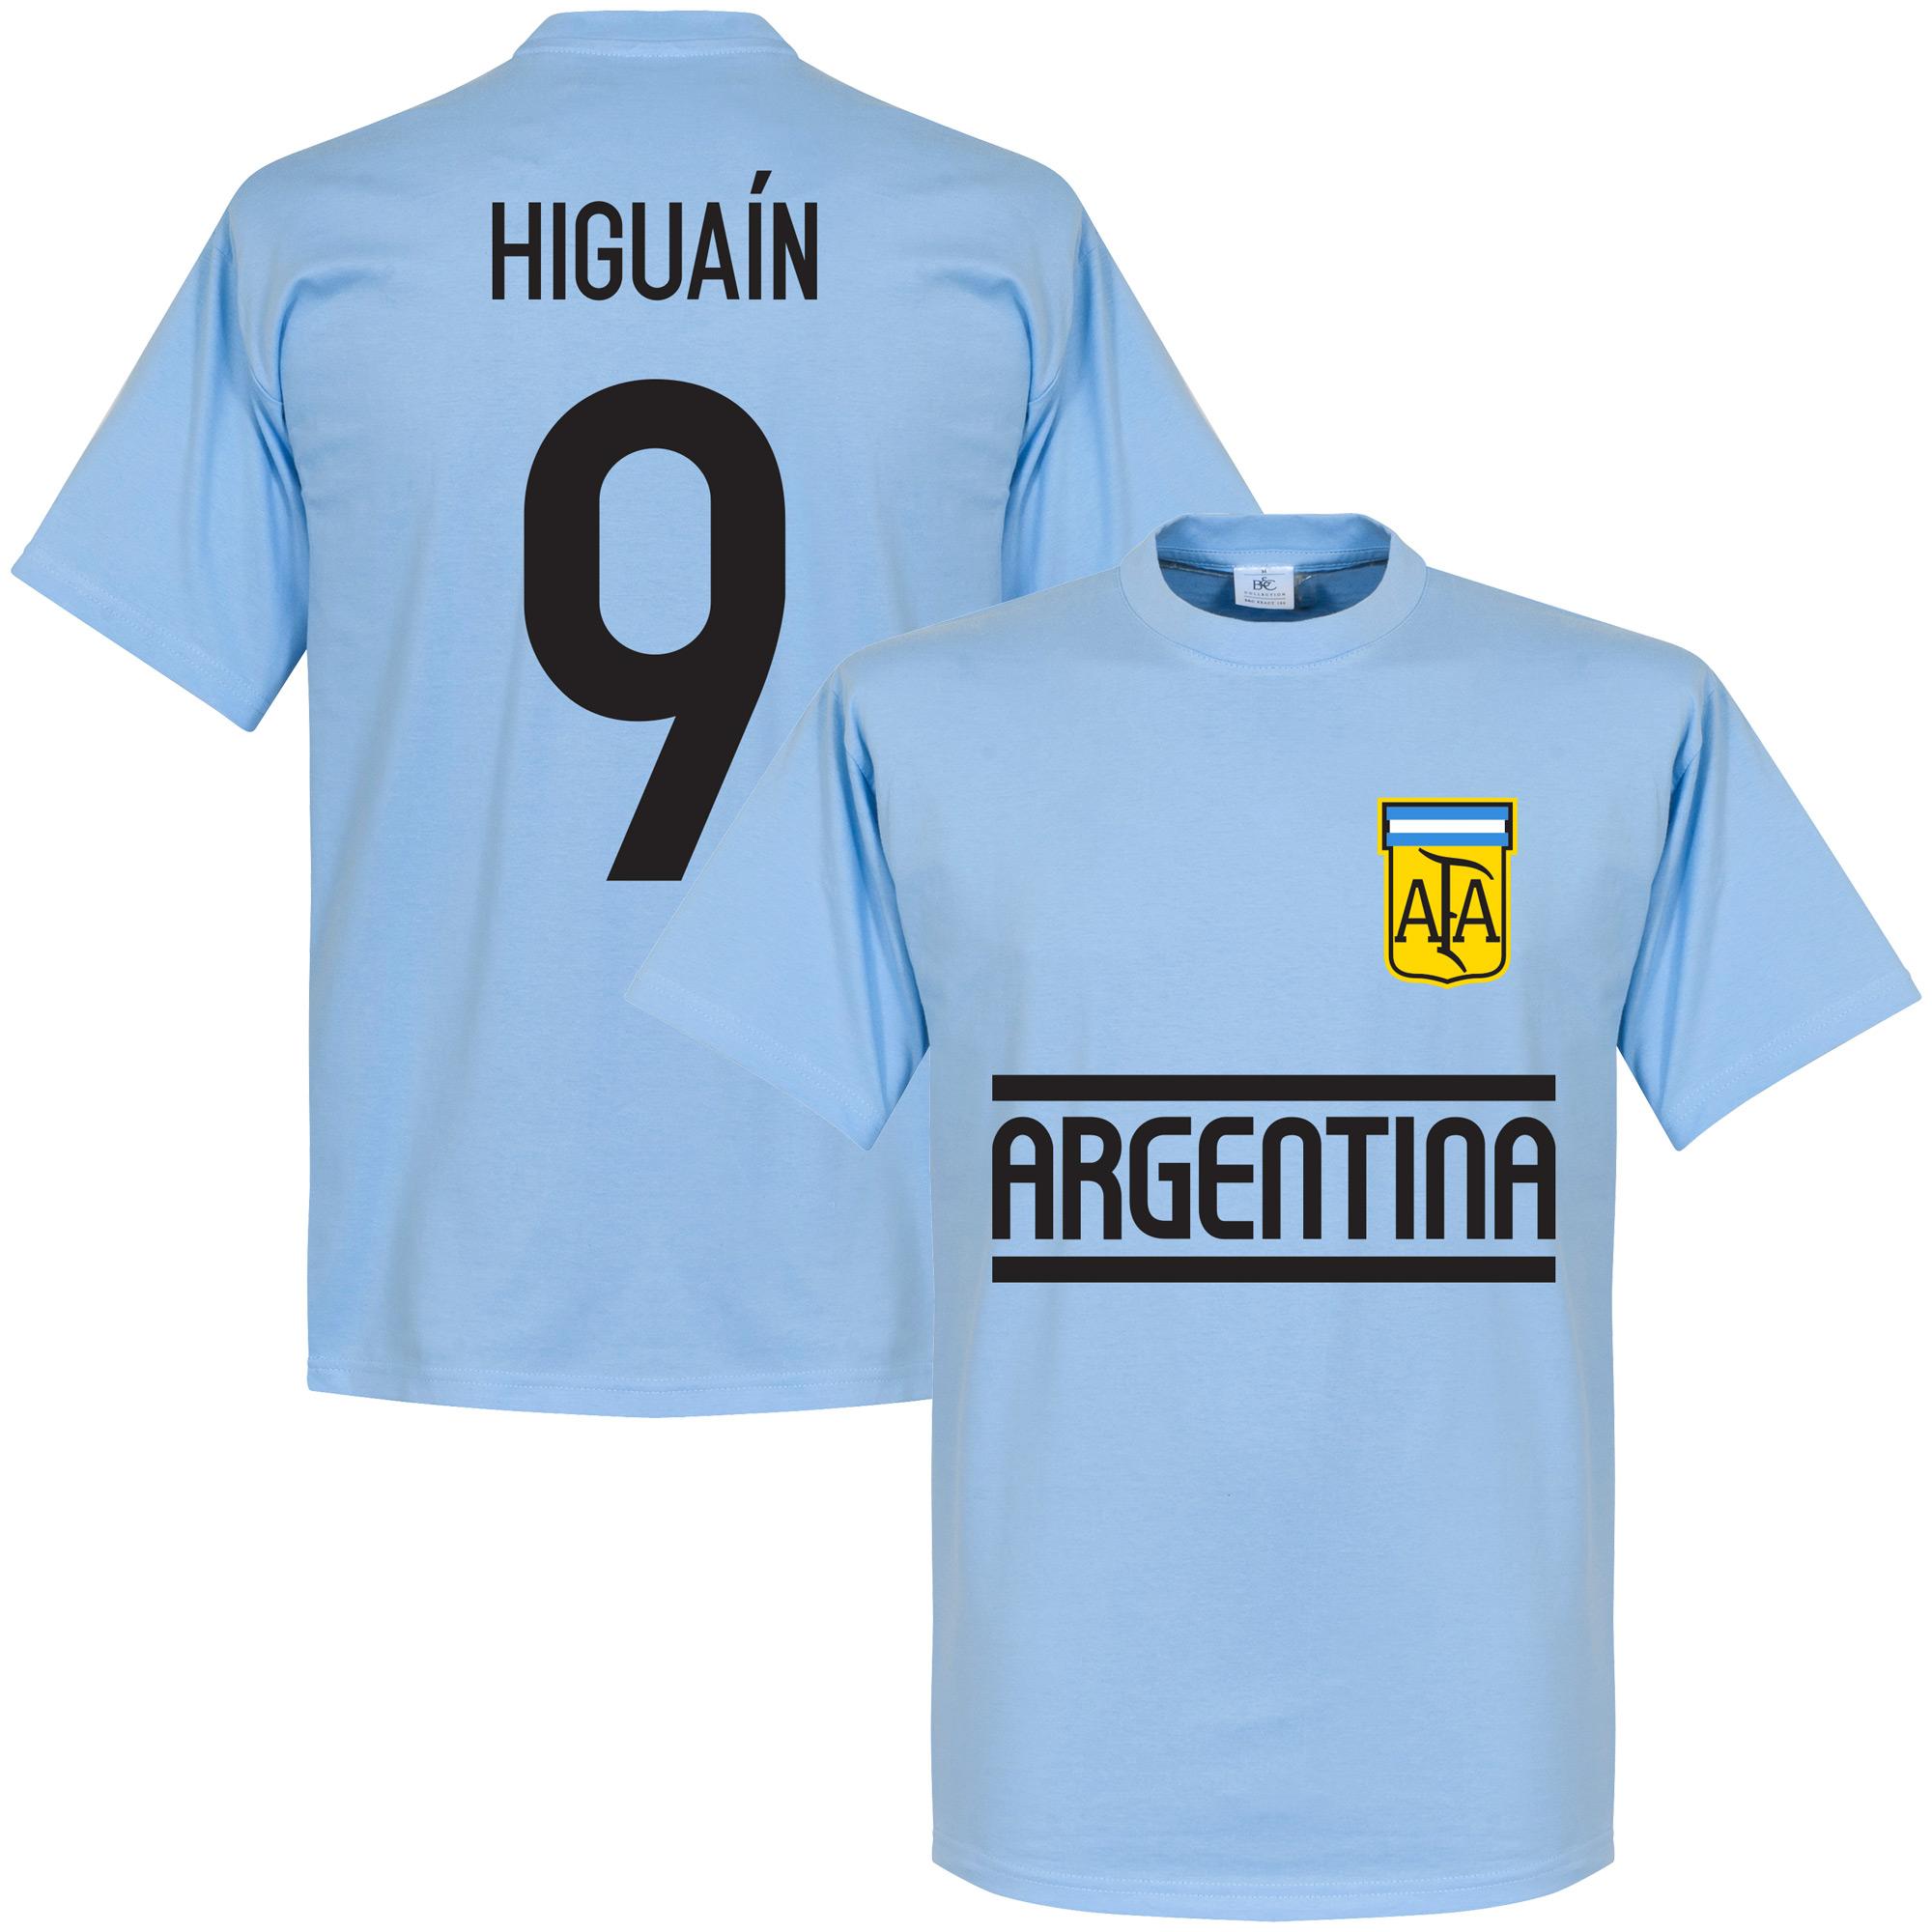 Argentina Higuain Team Tee - Sky - XS